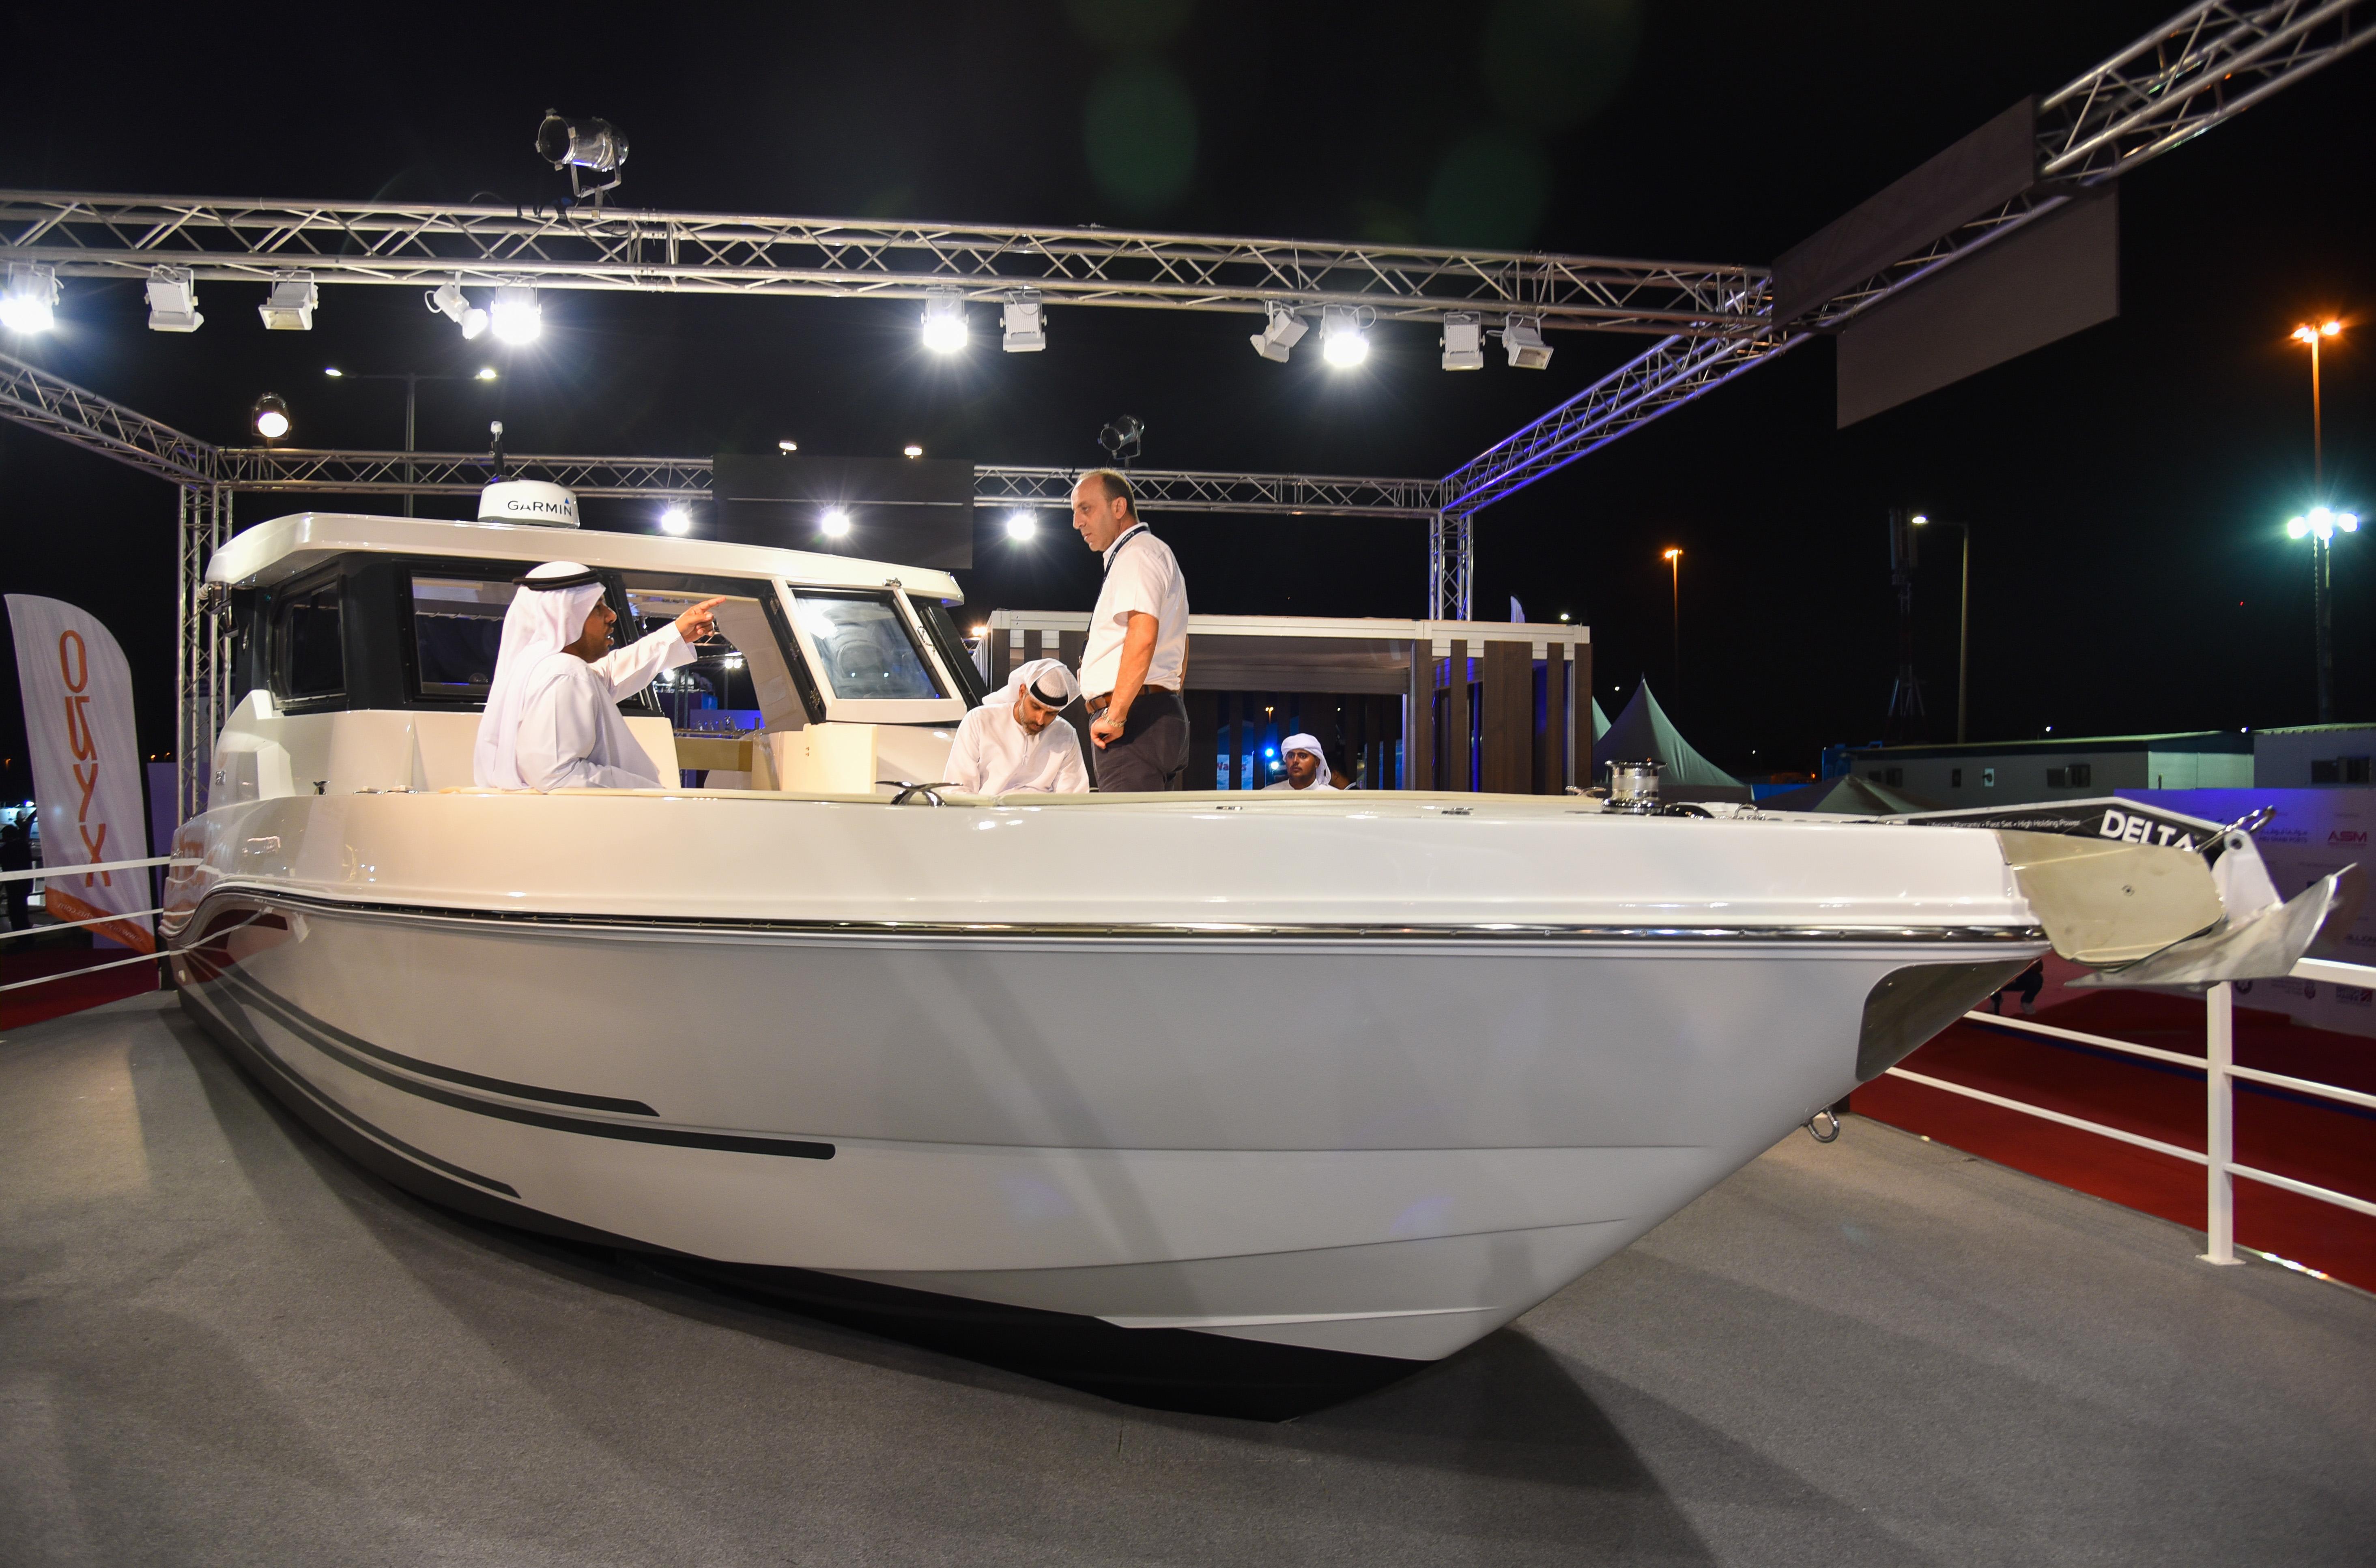 Gulf Craft at Abu Dhabi Boat Show 2018 Day 2(19).jpg